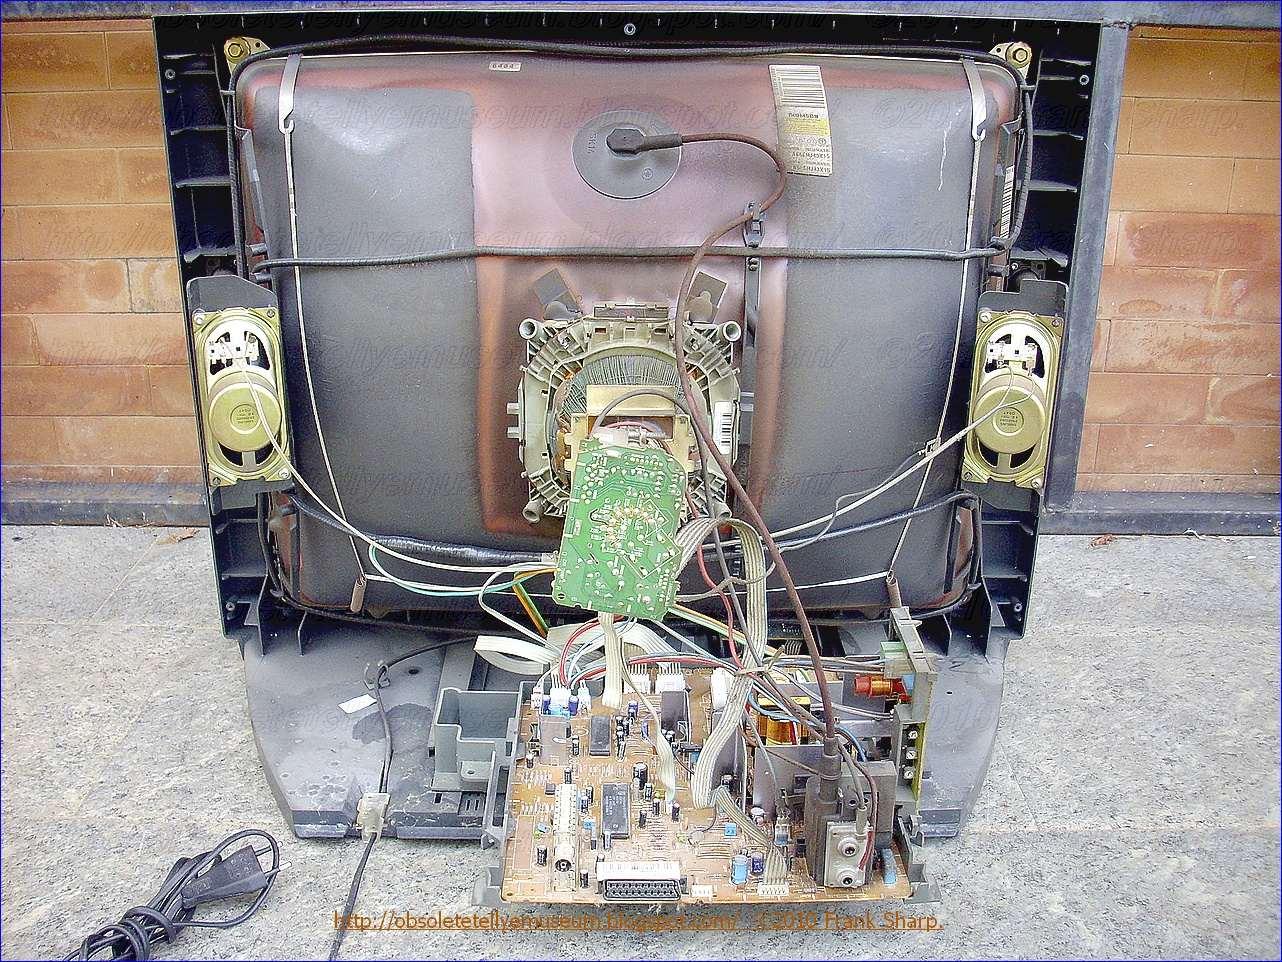 medium resolution of  wiring diagram on spa obsolete technology tellye thomson 28dg17e blackpearl 413 on spa motor